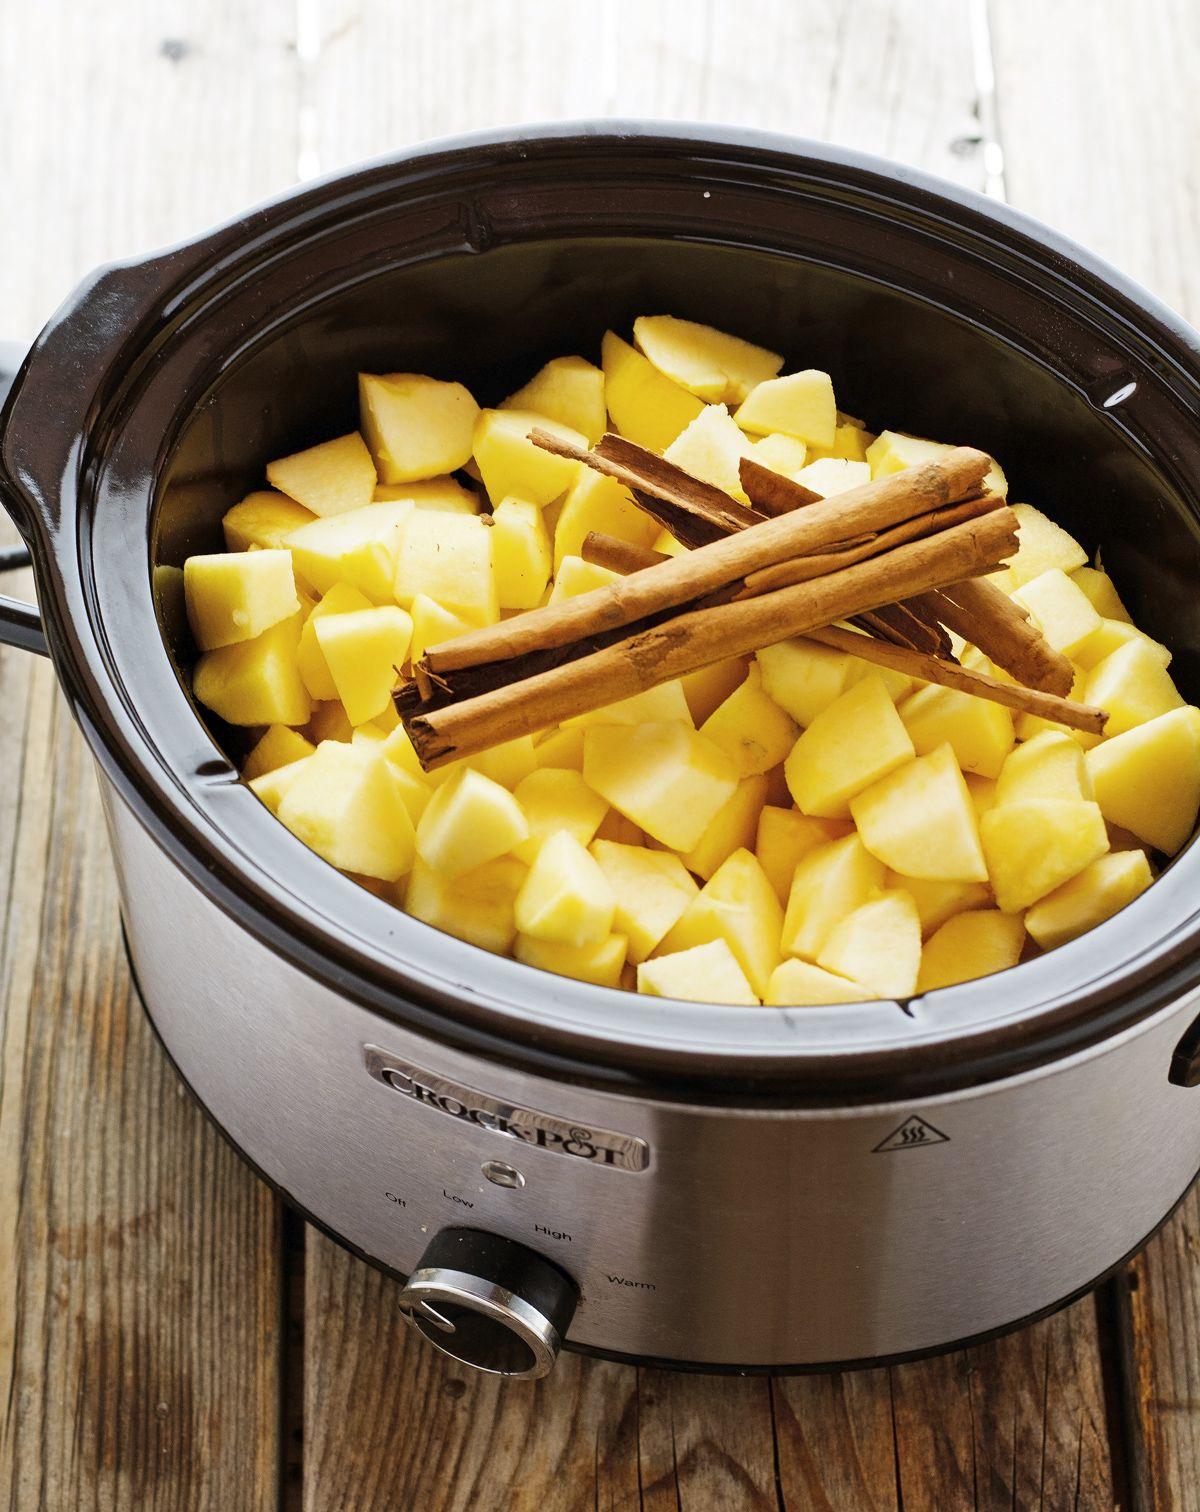 Crock Pot Cinnamon Applesauce (No Added Sugar